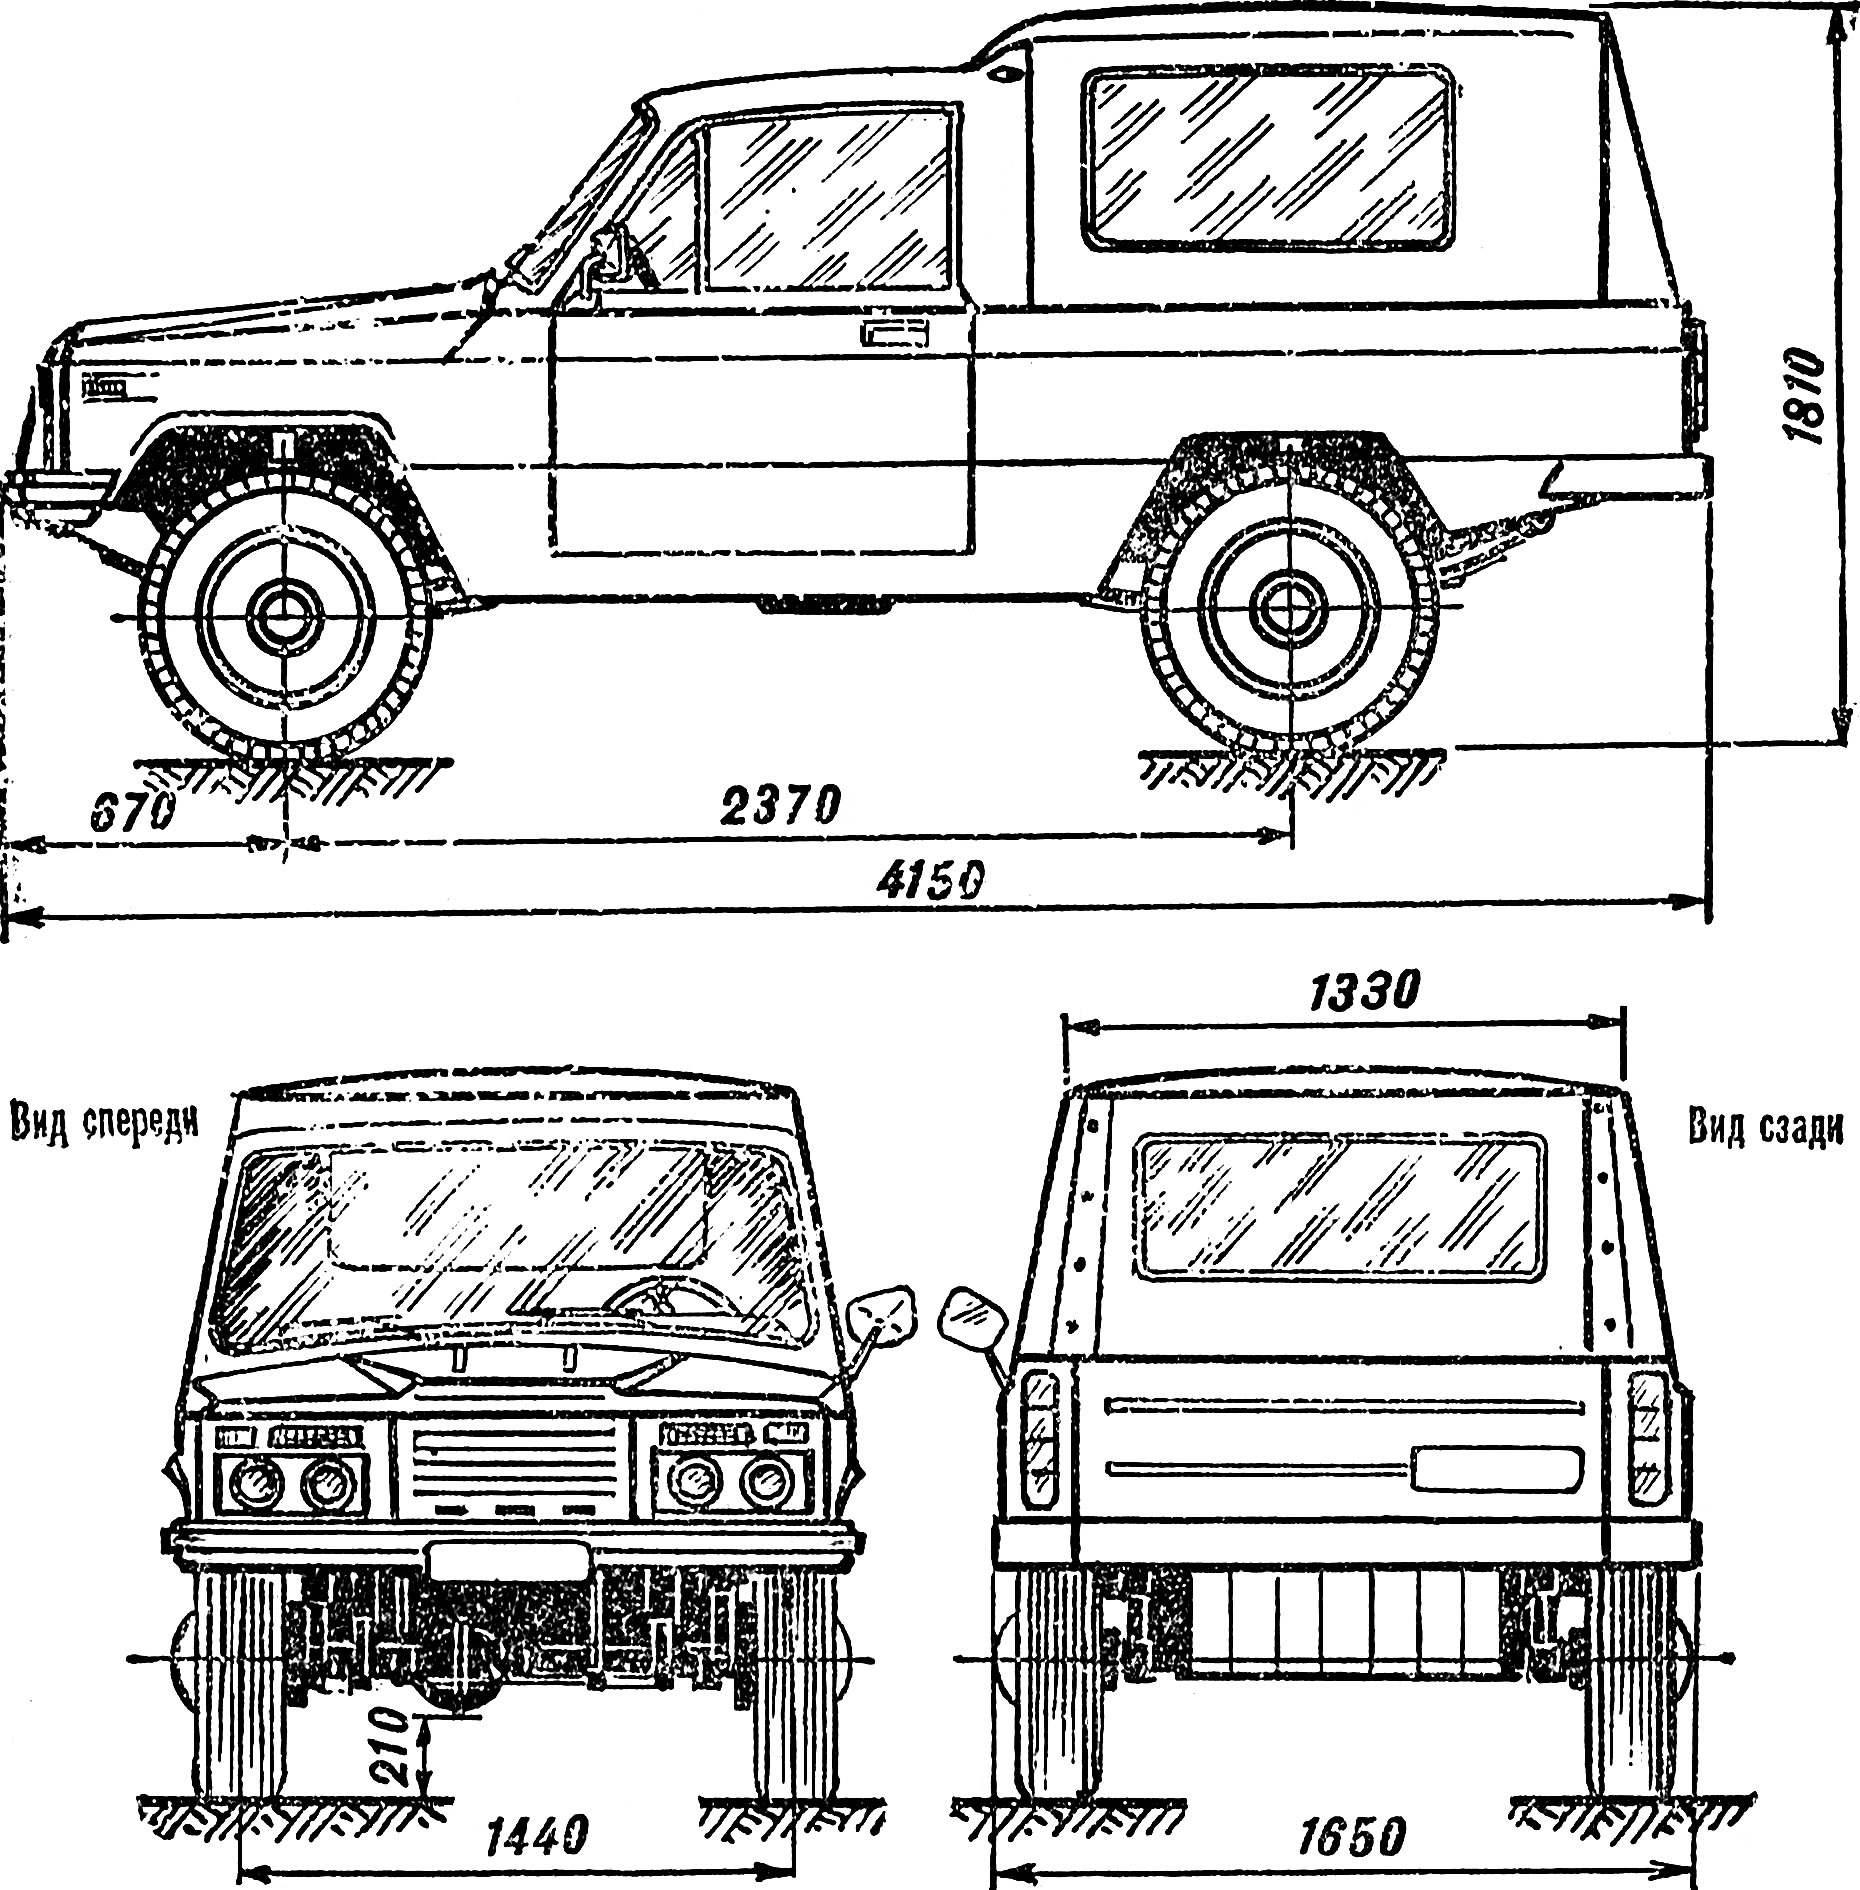 Рис. 1. Автомобиль «Нева».